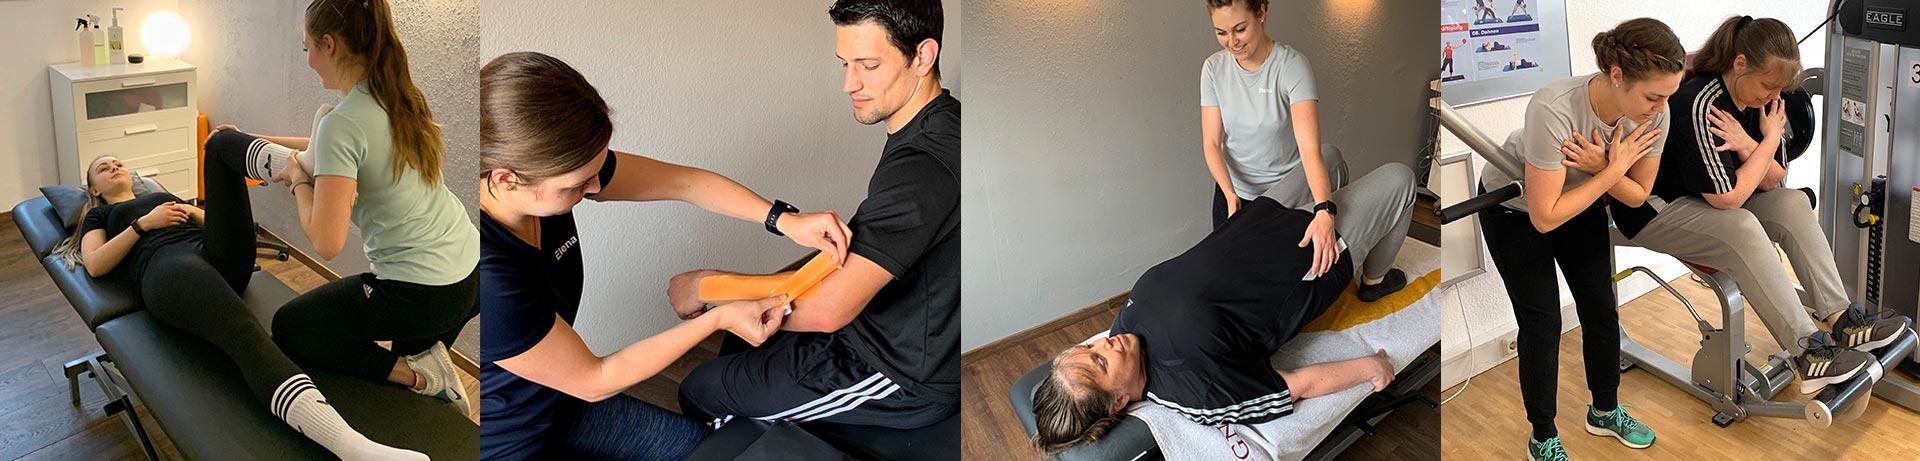 Physiotherapie & Krankengymnastik im Rehaktiv Engelskirchen